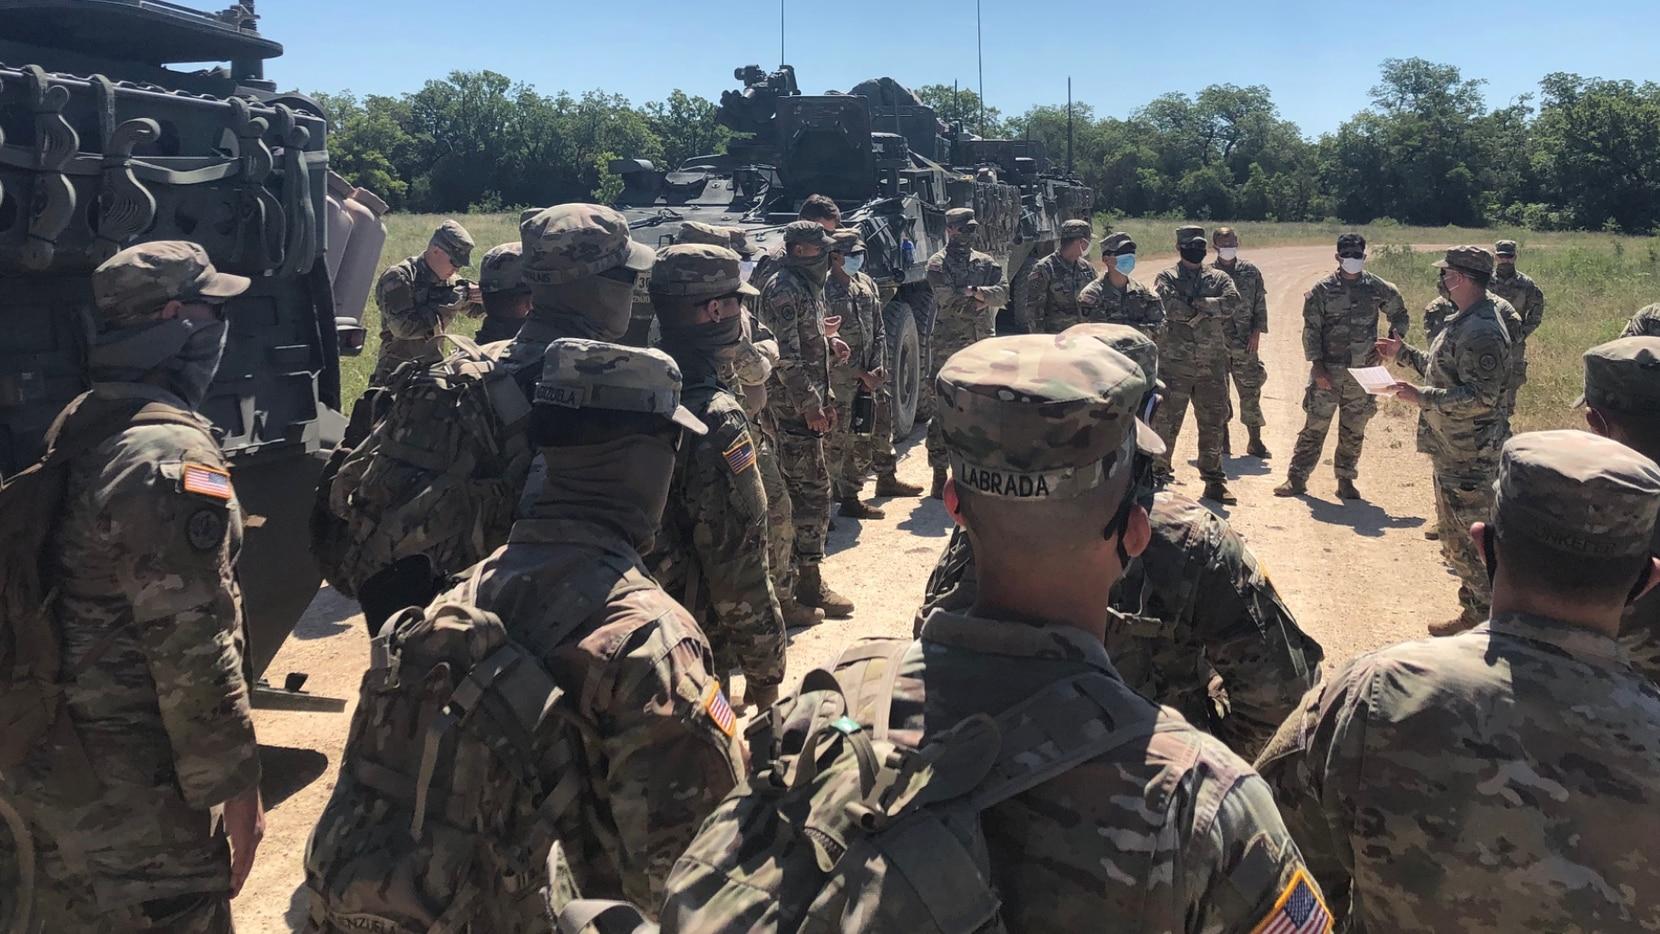 Militares participan en la búsqueda de Vanessa Guillén, la joven soldado originaria de Houston que desapareció el 22 de abril en la base militar de Fort Hood, Texas.